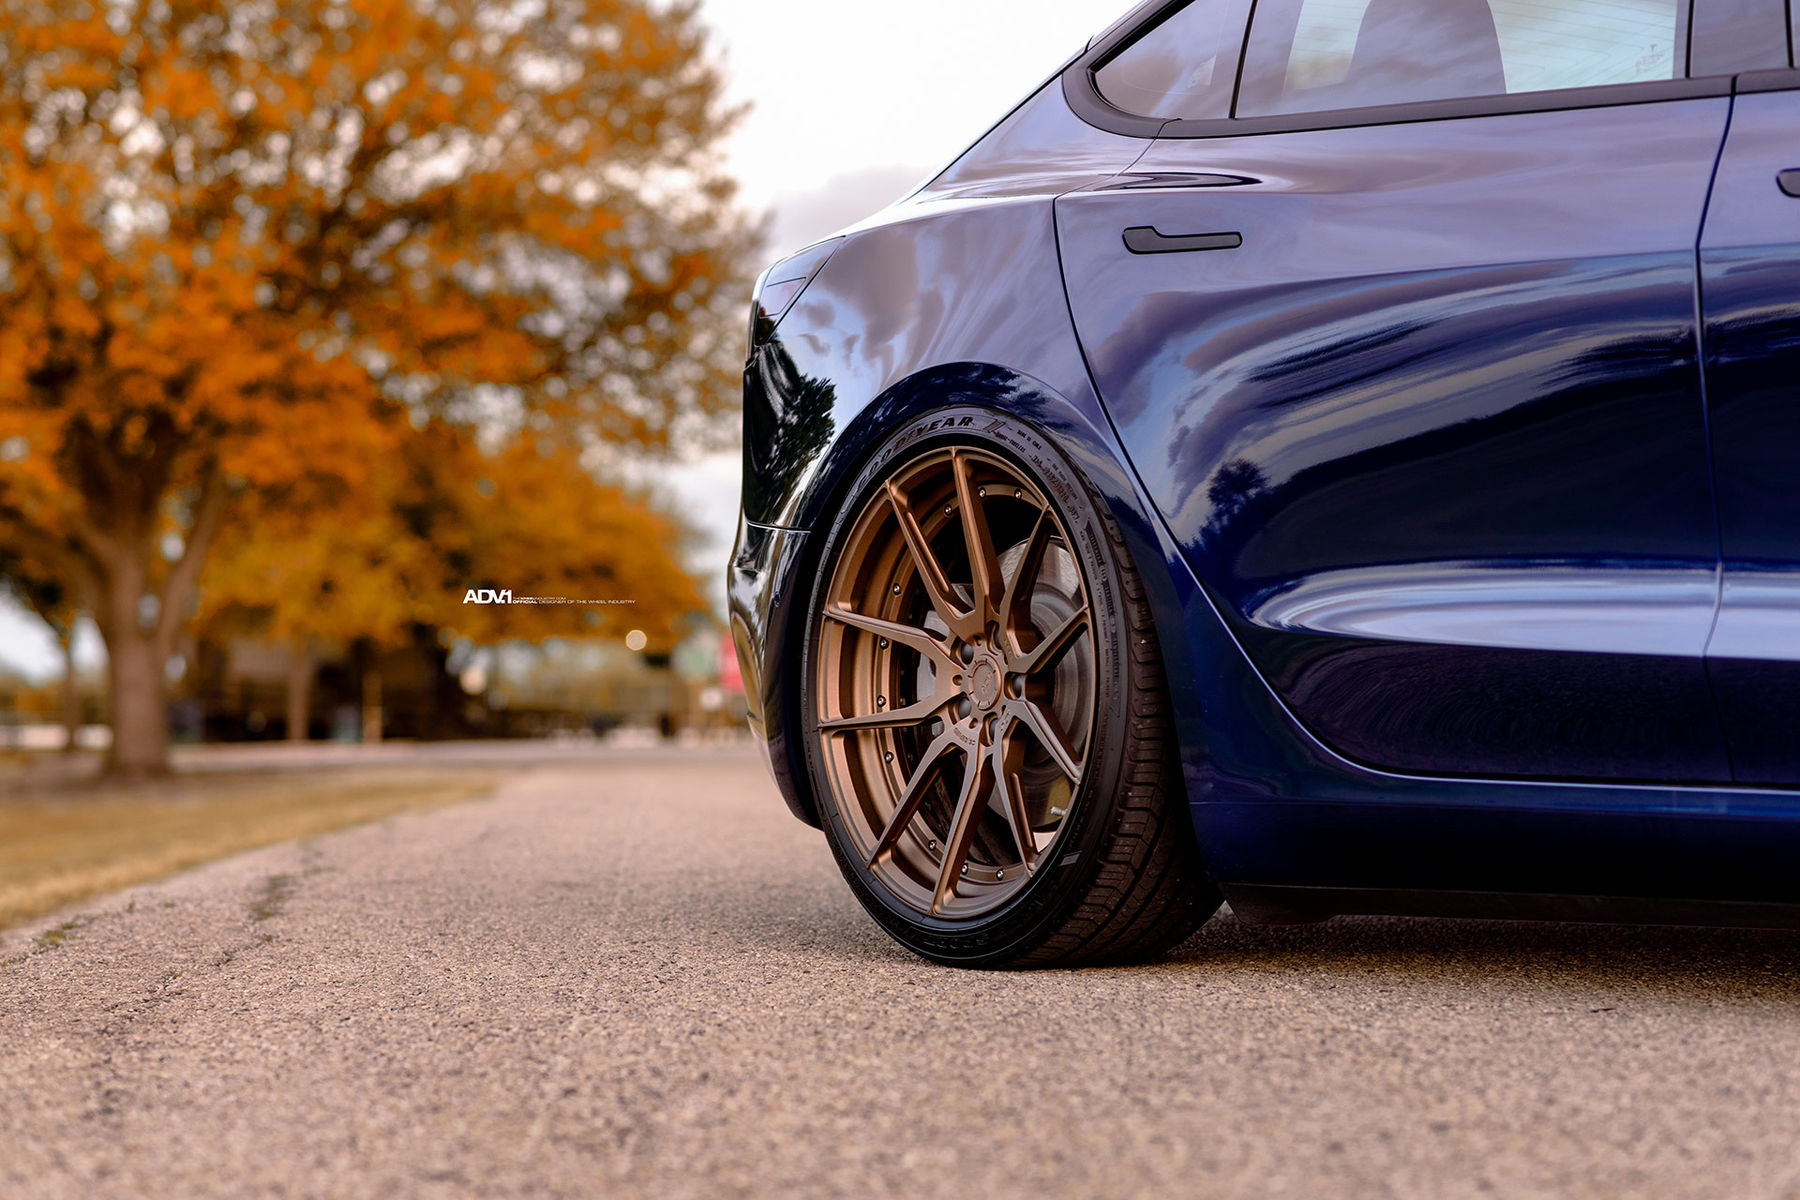 2018 Tesla  | Tesla Model 3 - ADV.1 ADV5.0 M.V2 CS Series Wheels